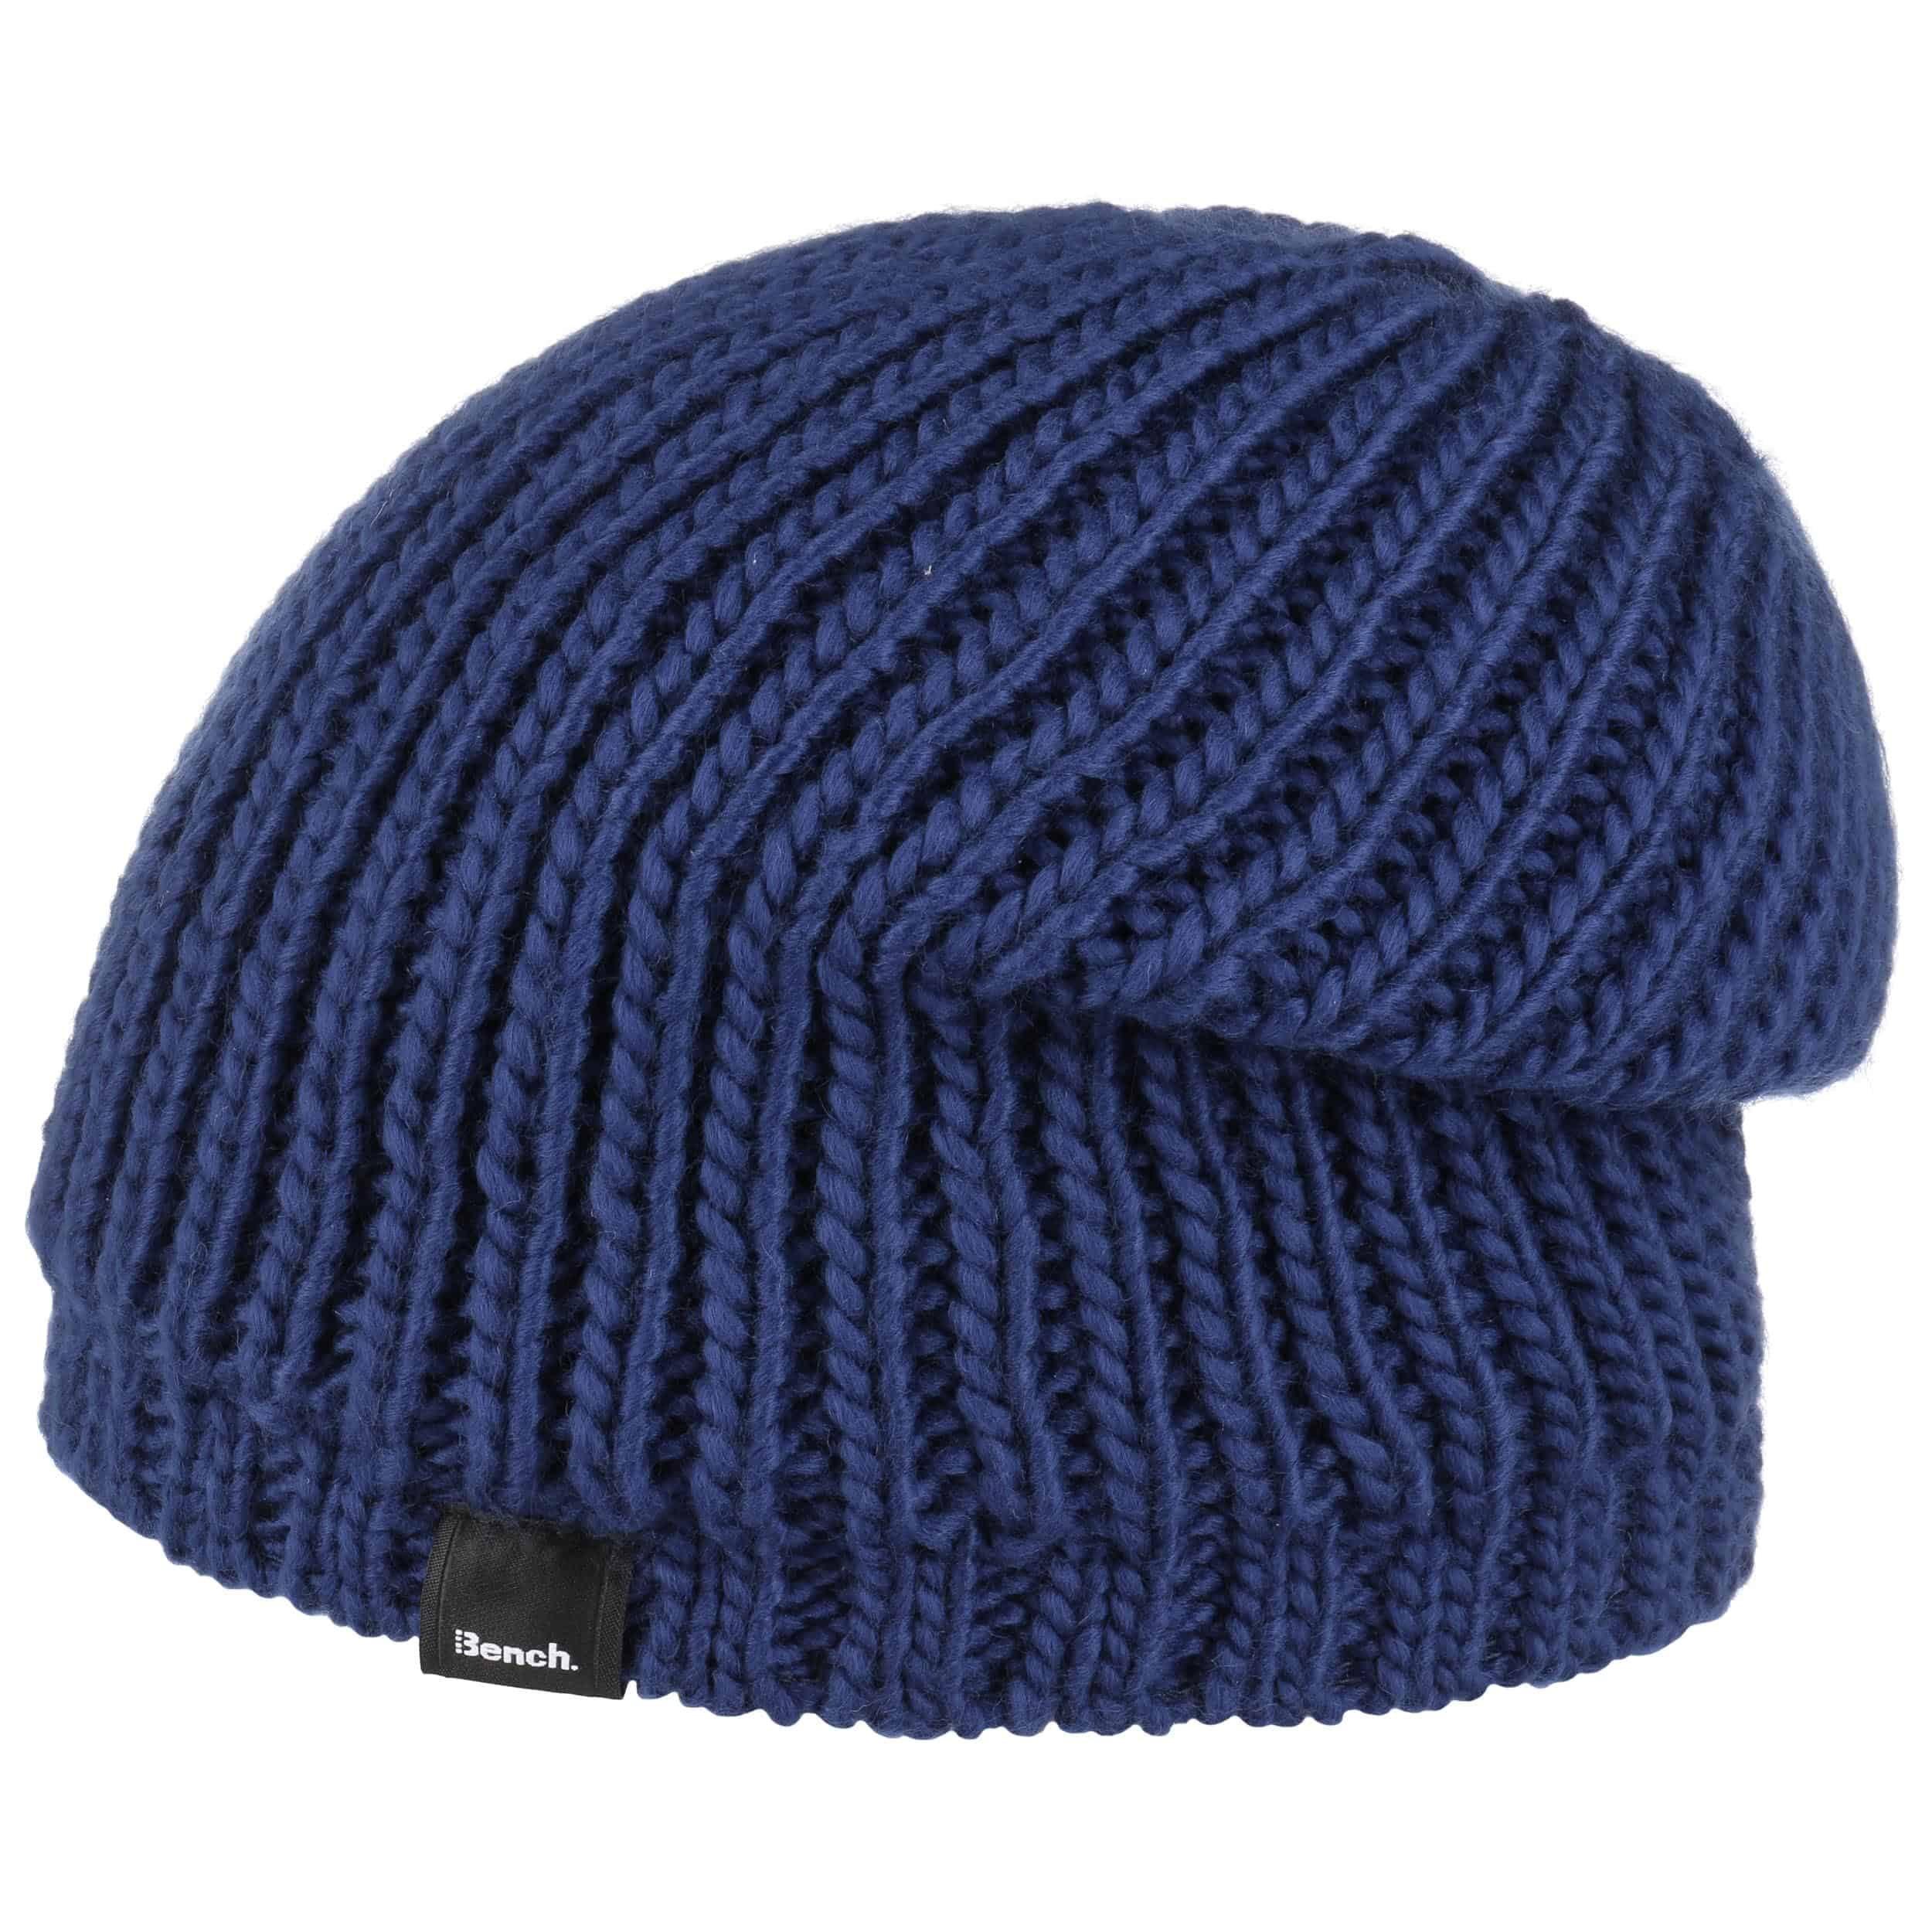 0600b2a60ac ... Long Beanie Knit Hat by Bench - orange 3